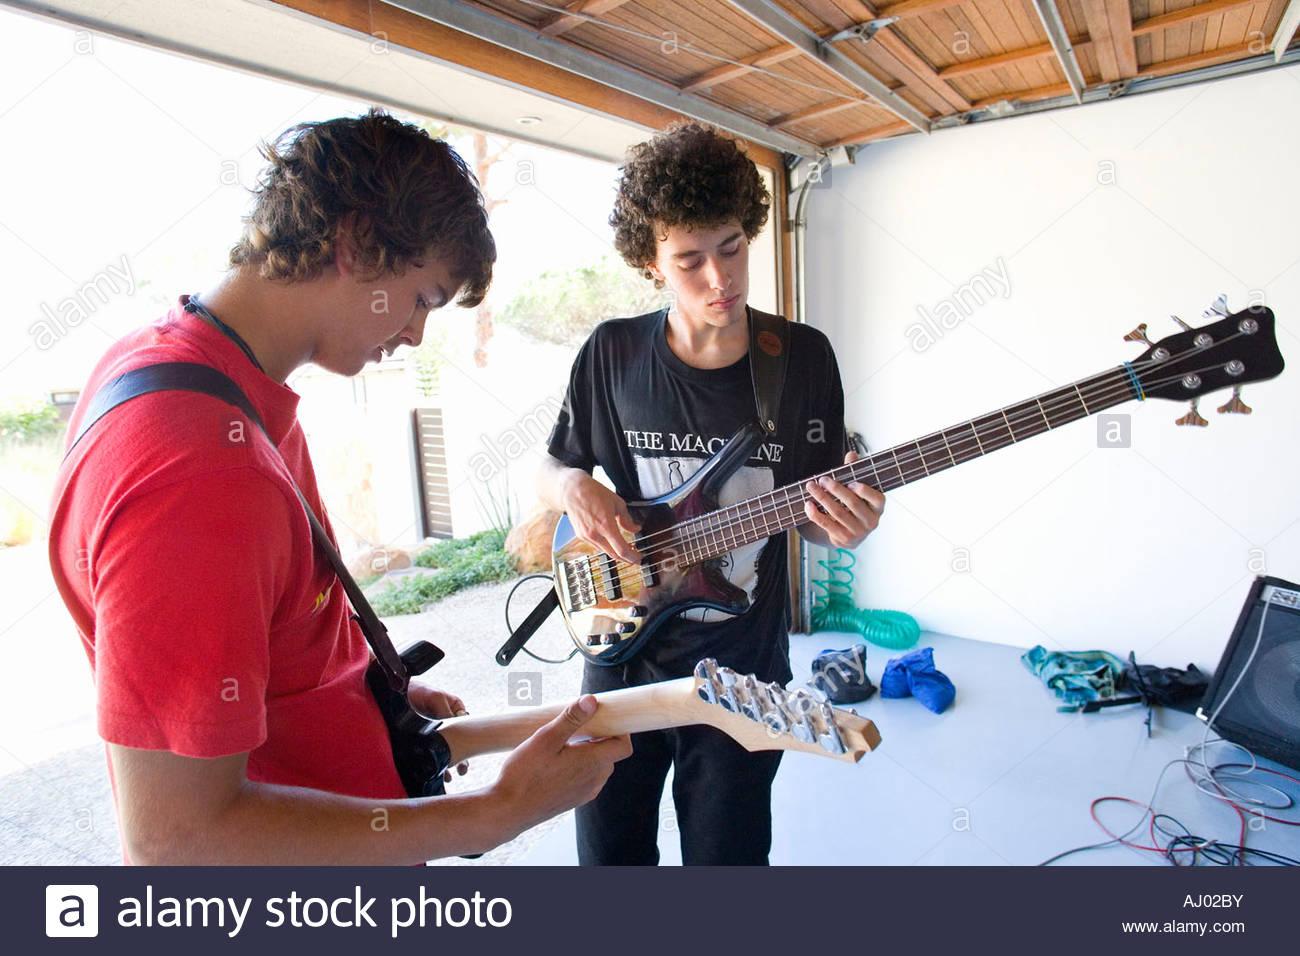 Two teenage boys  playing guitars in garage - Stock Image